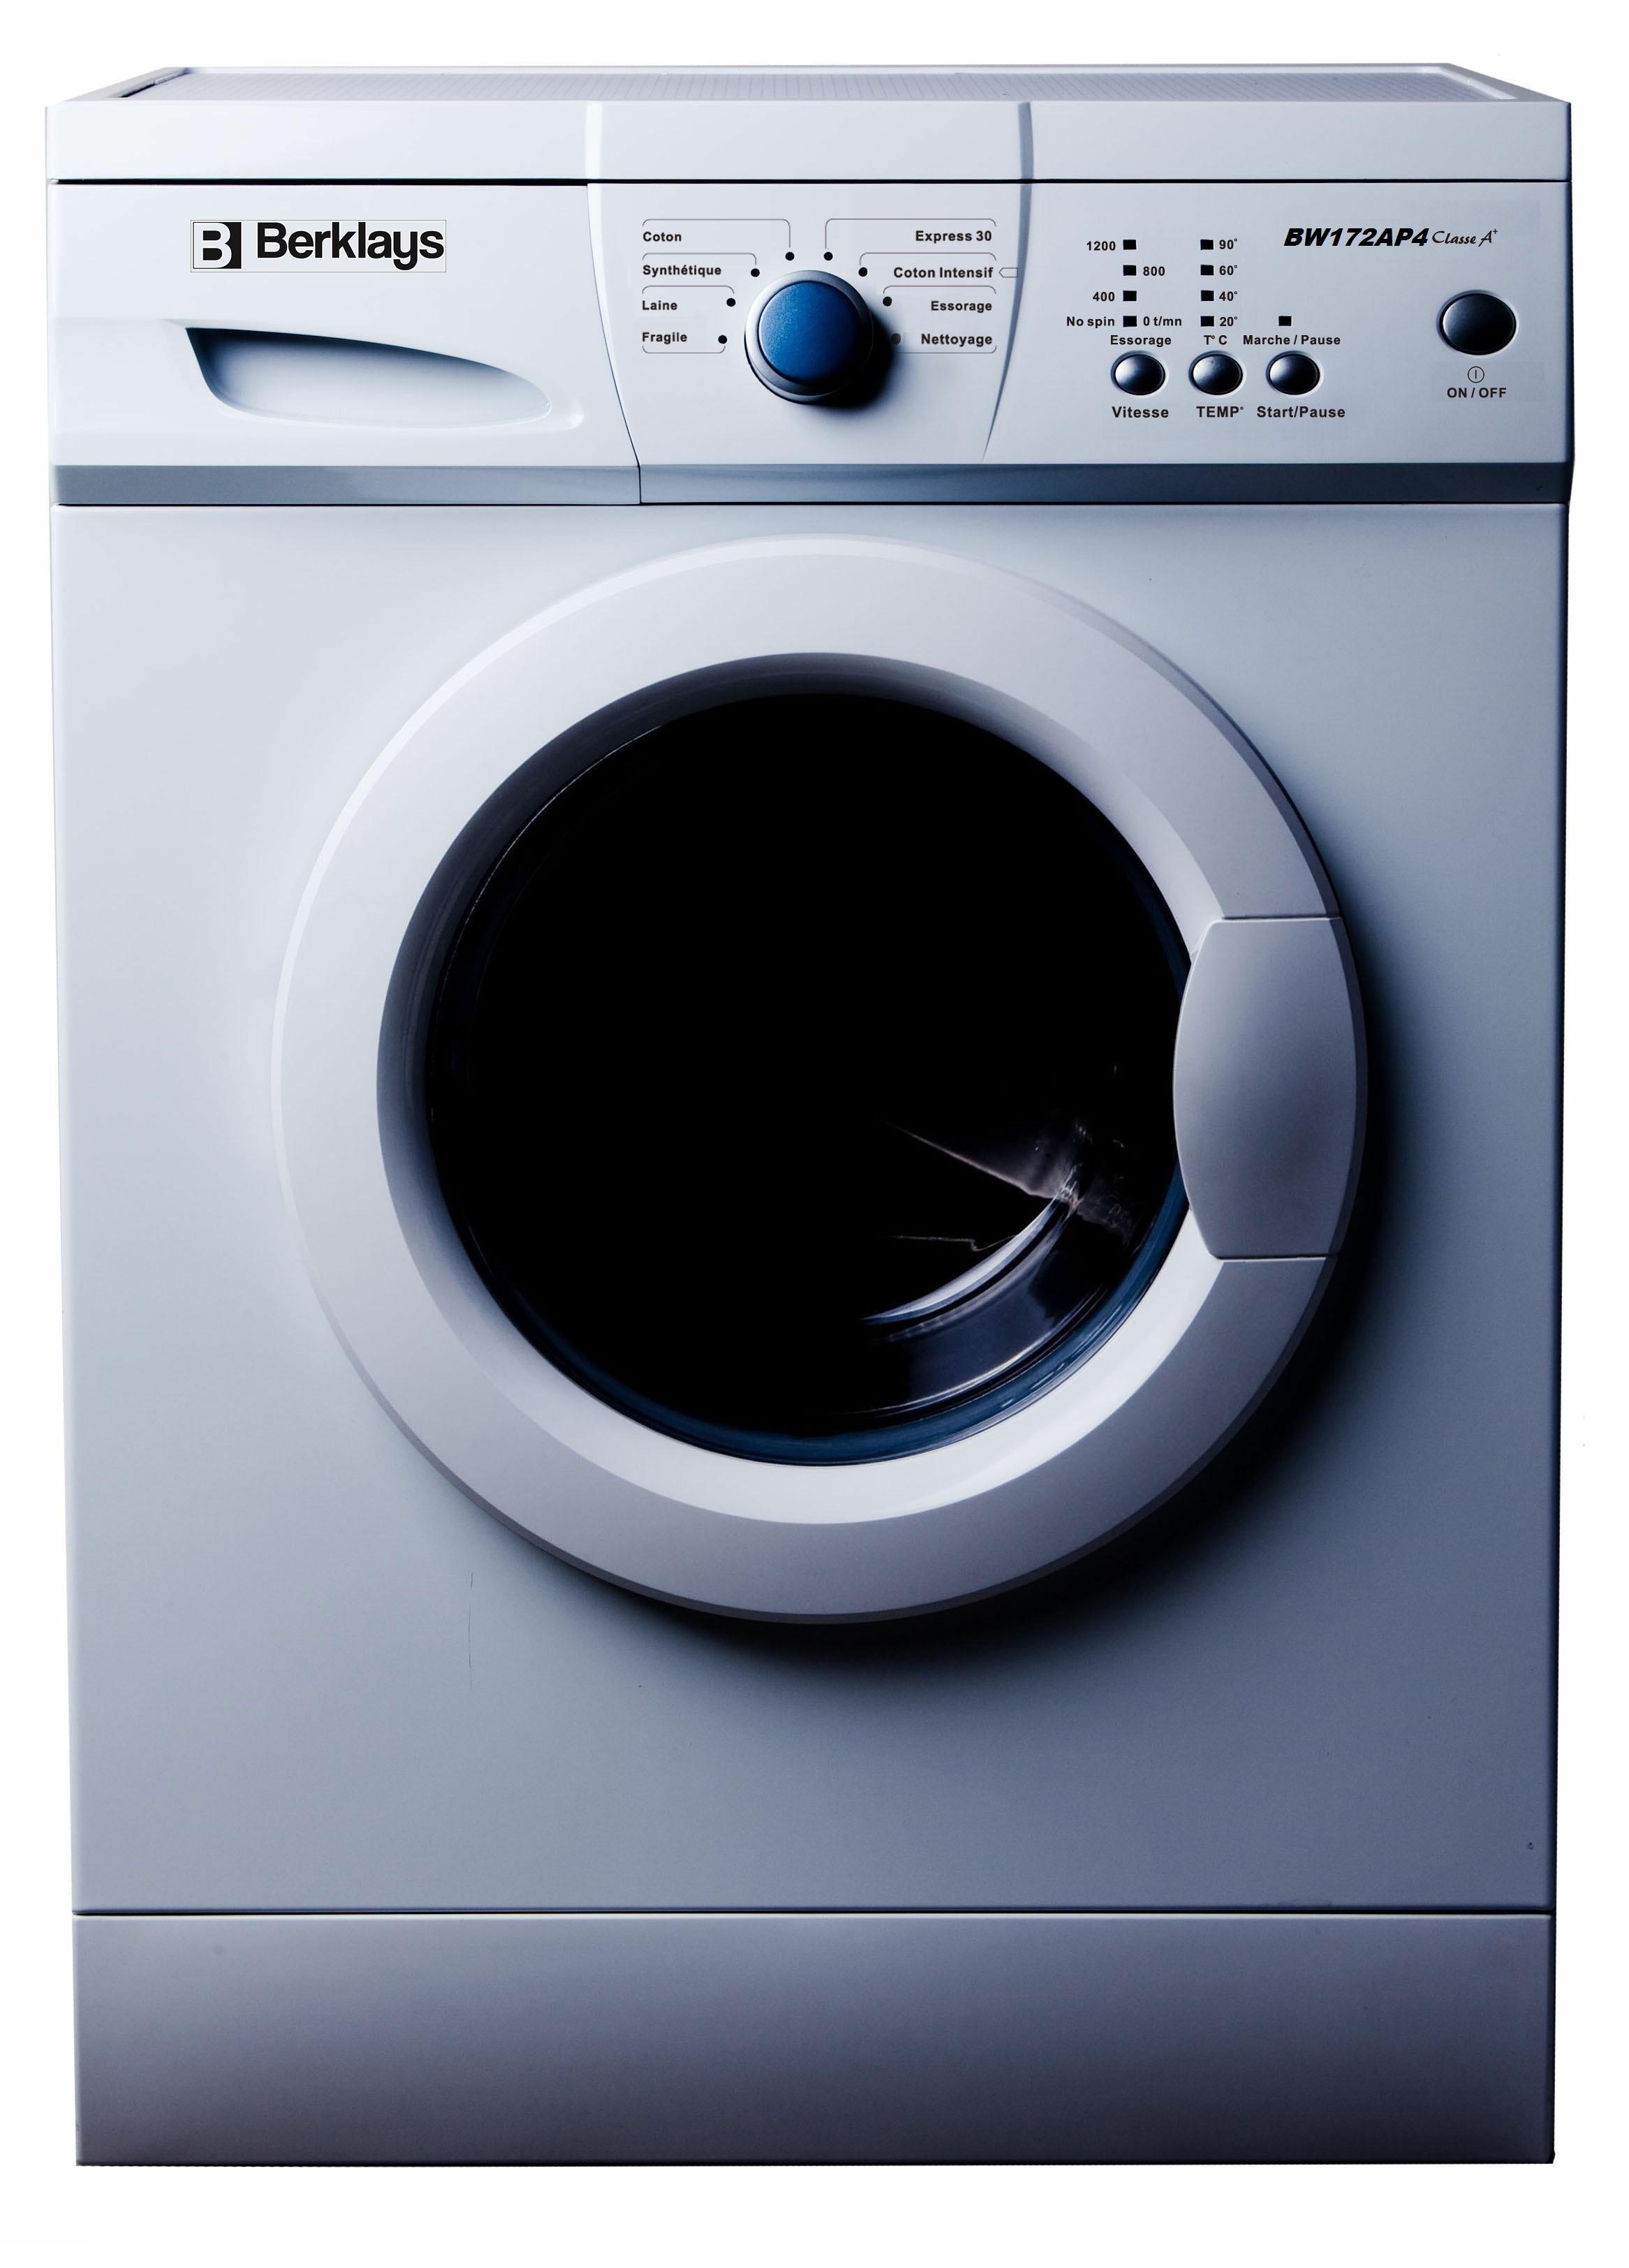 machine laver 7 8 kgs berklays. Black Bedroom Furniture Sets. Home Design Ideas